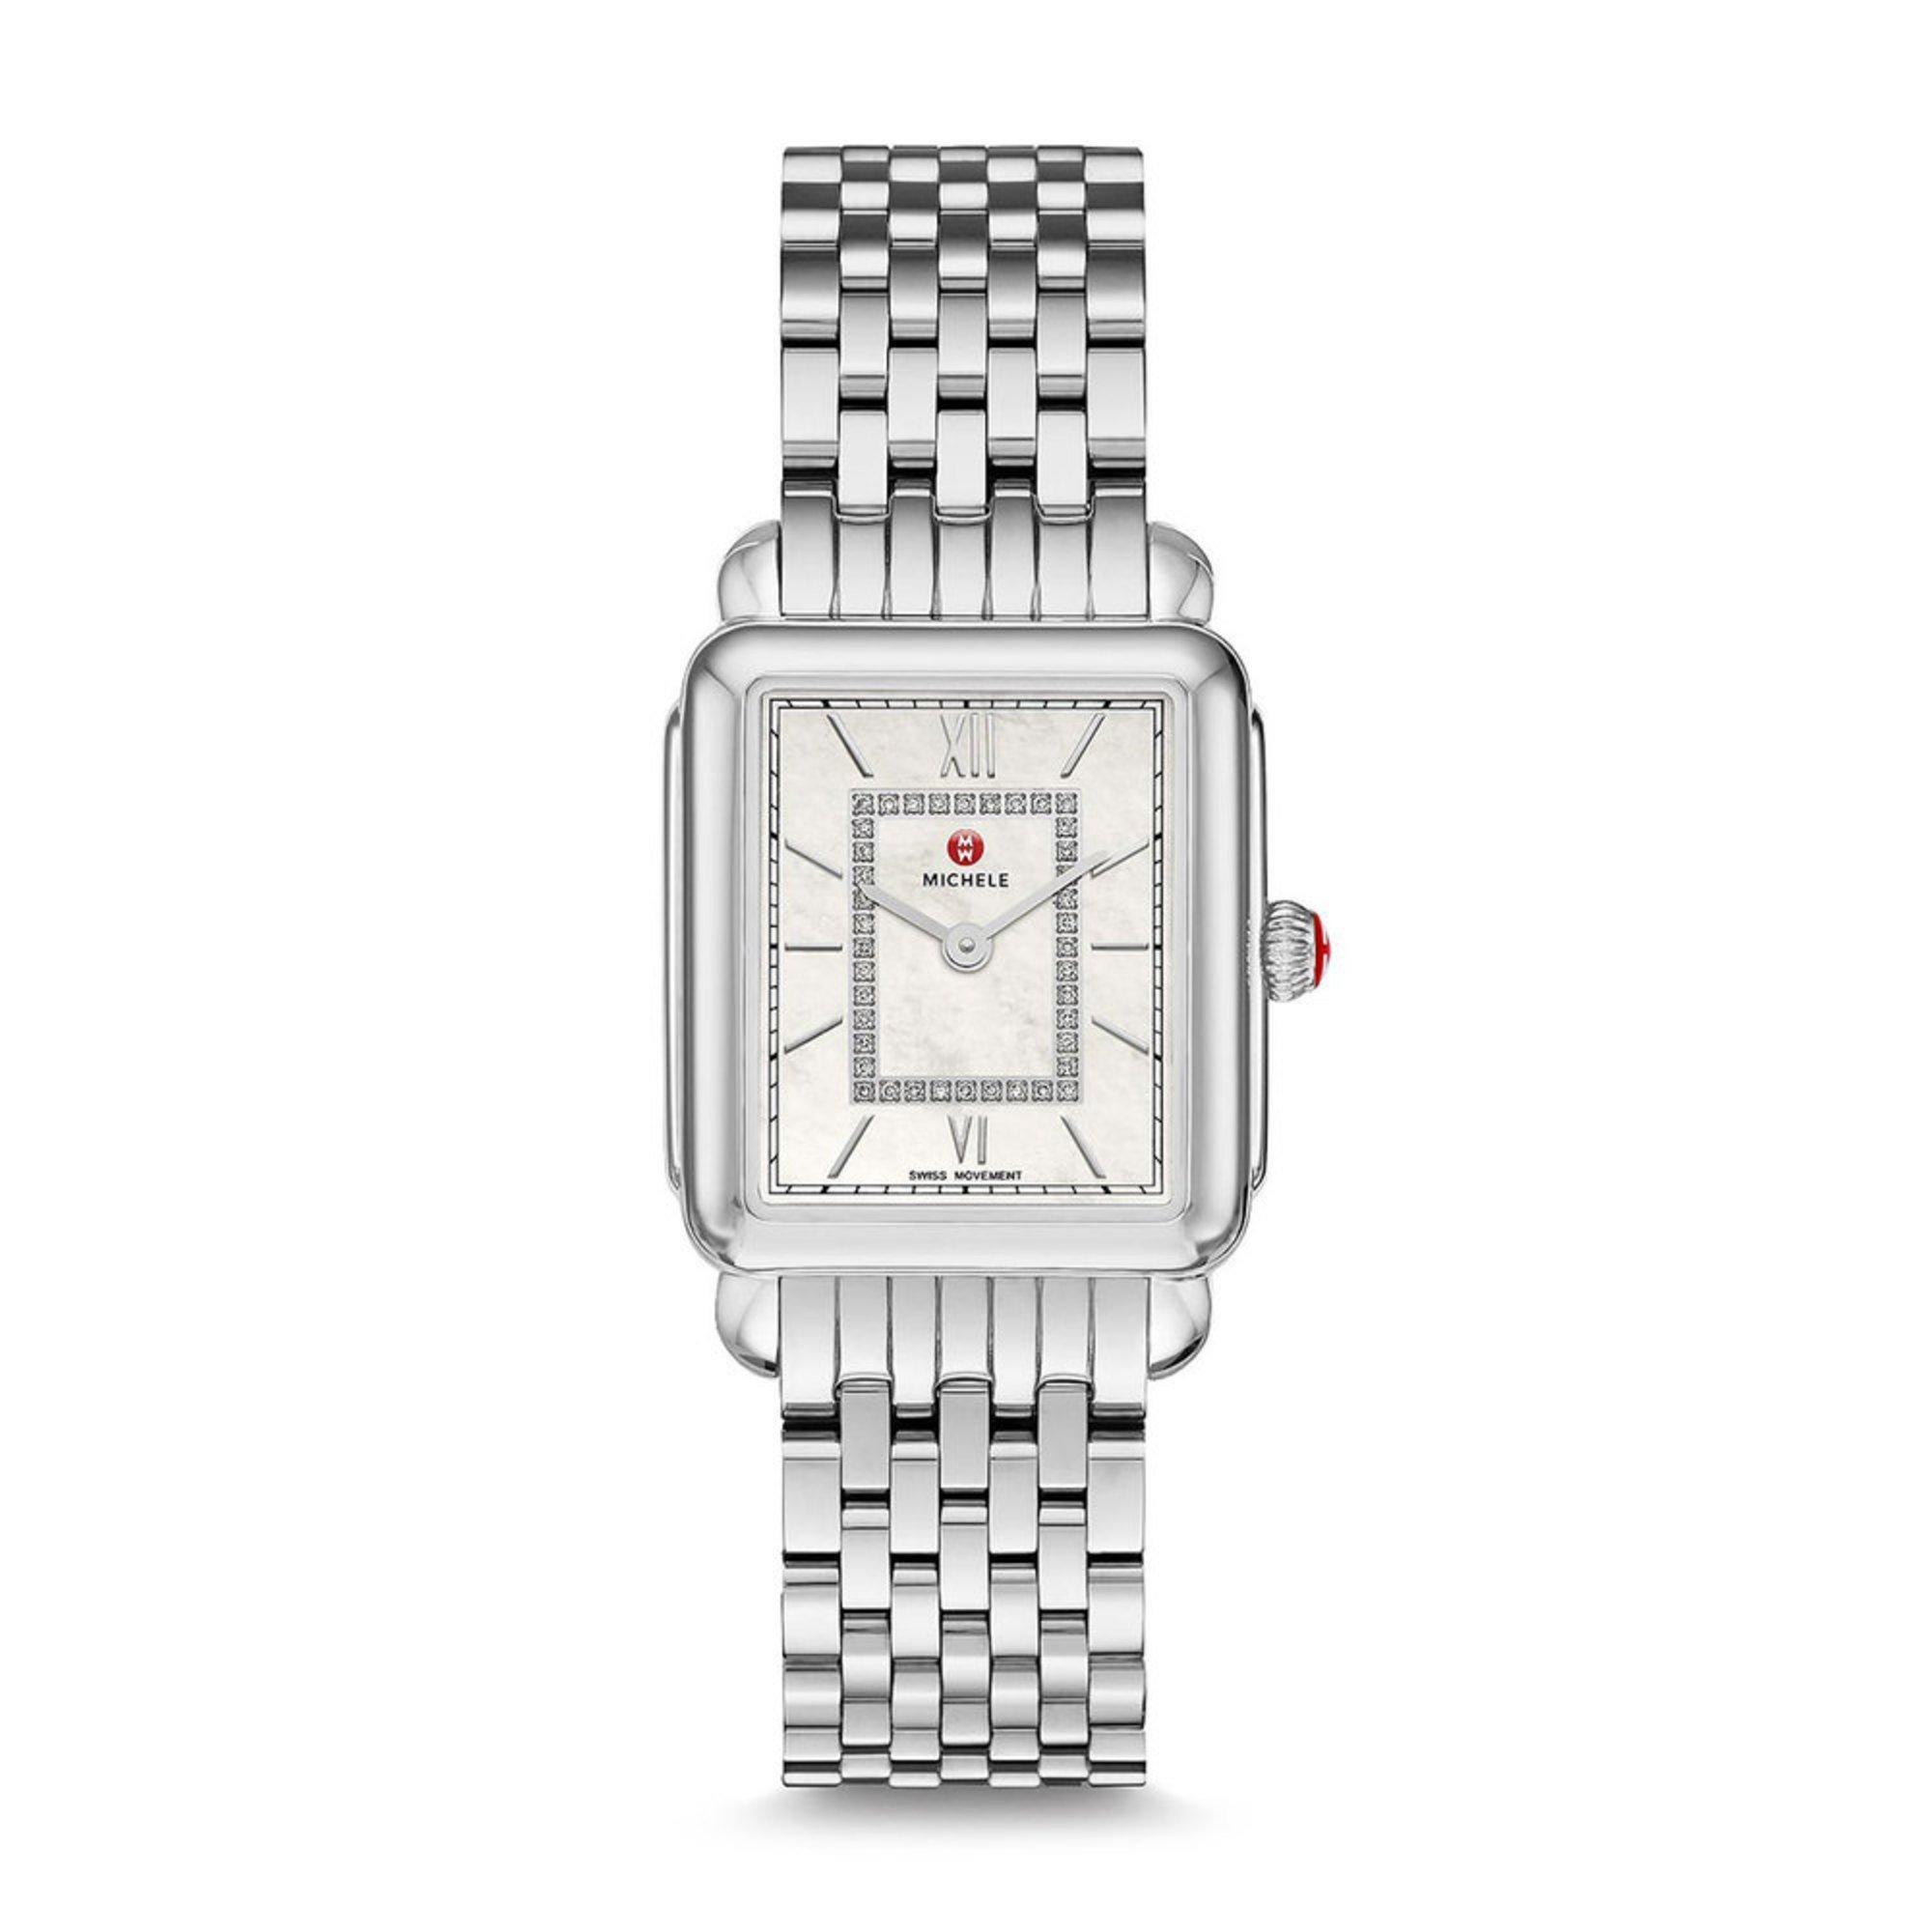 8bda2da2014 Michele Women's Deco Ii Stainless Diamond Mid Watch, 26mm | Women's Watches  | Accessories - Shop Your Navy Exchange - Official Site